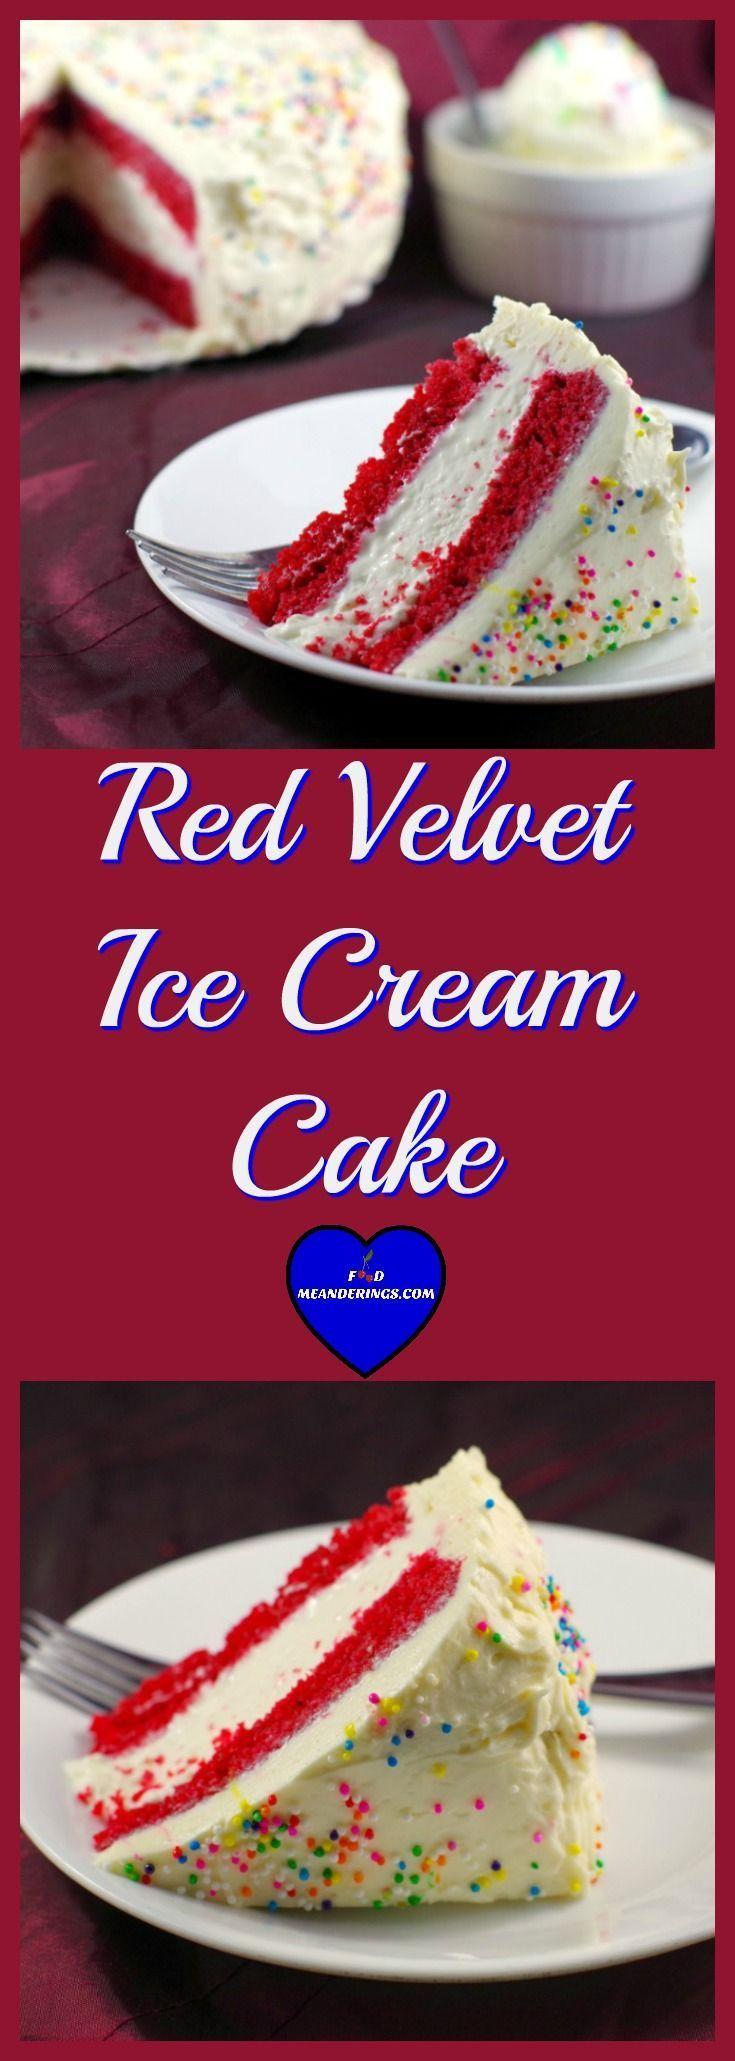 Red Velvet Ice Cream Cake Food Meanderings Recipe Ice Cream Cake Velvet Ice Cream Frozen Dessert Recipe